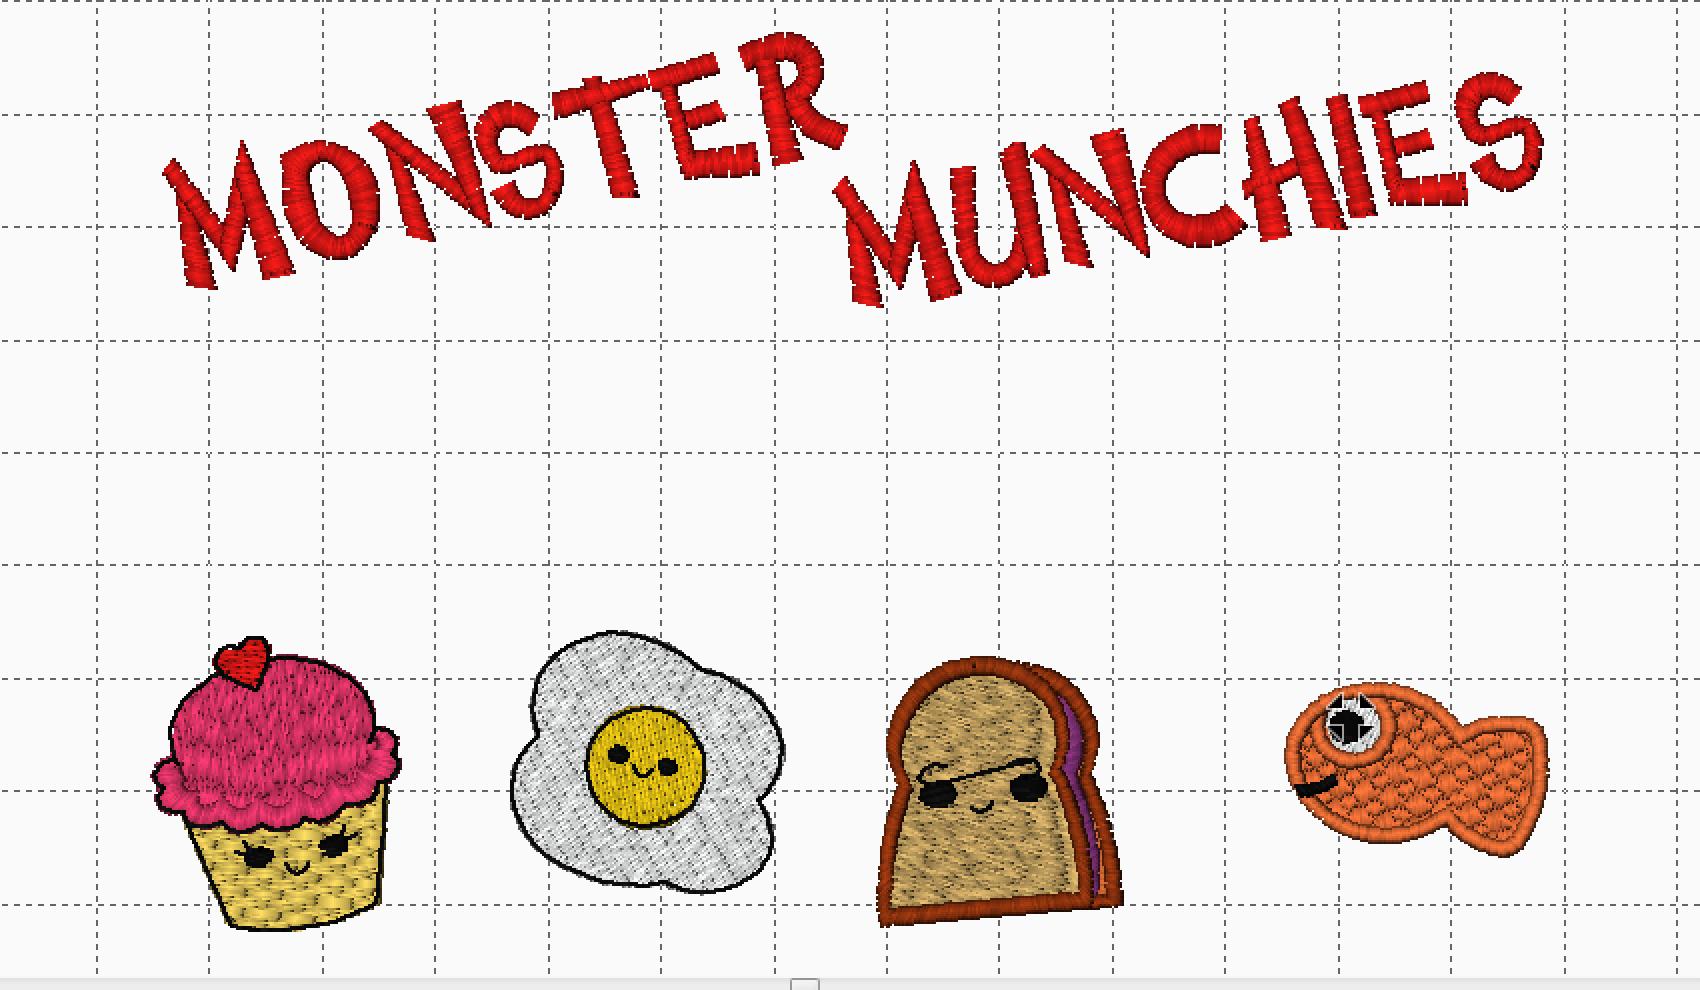 Monster Munchies Design on Gridded Background